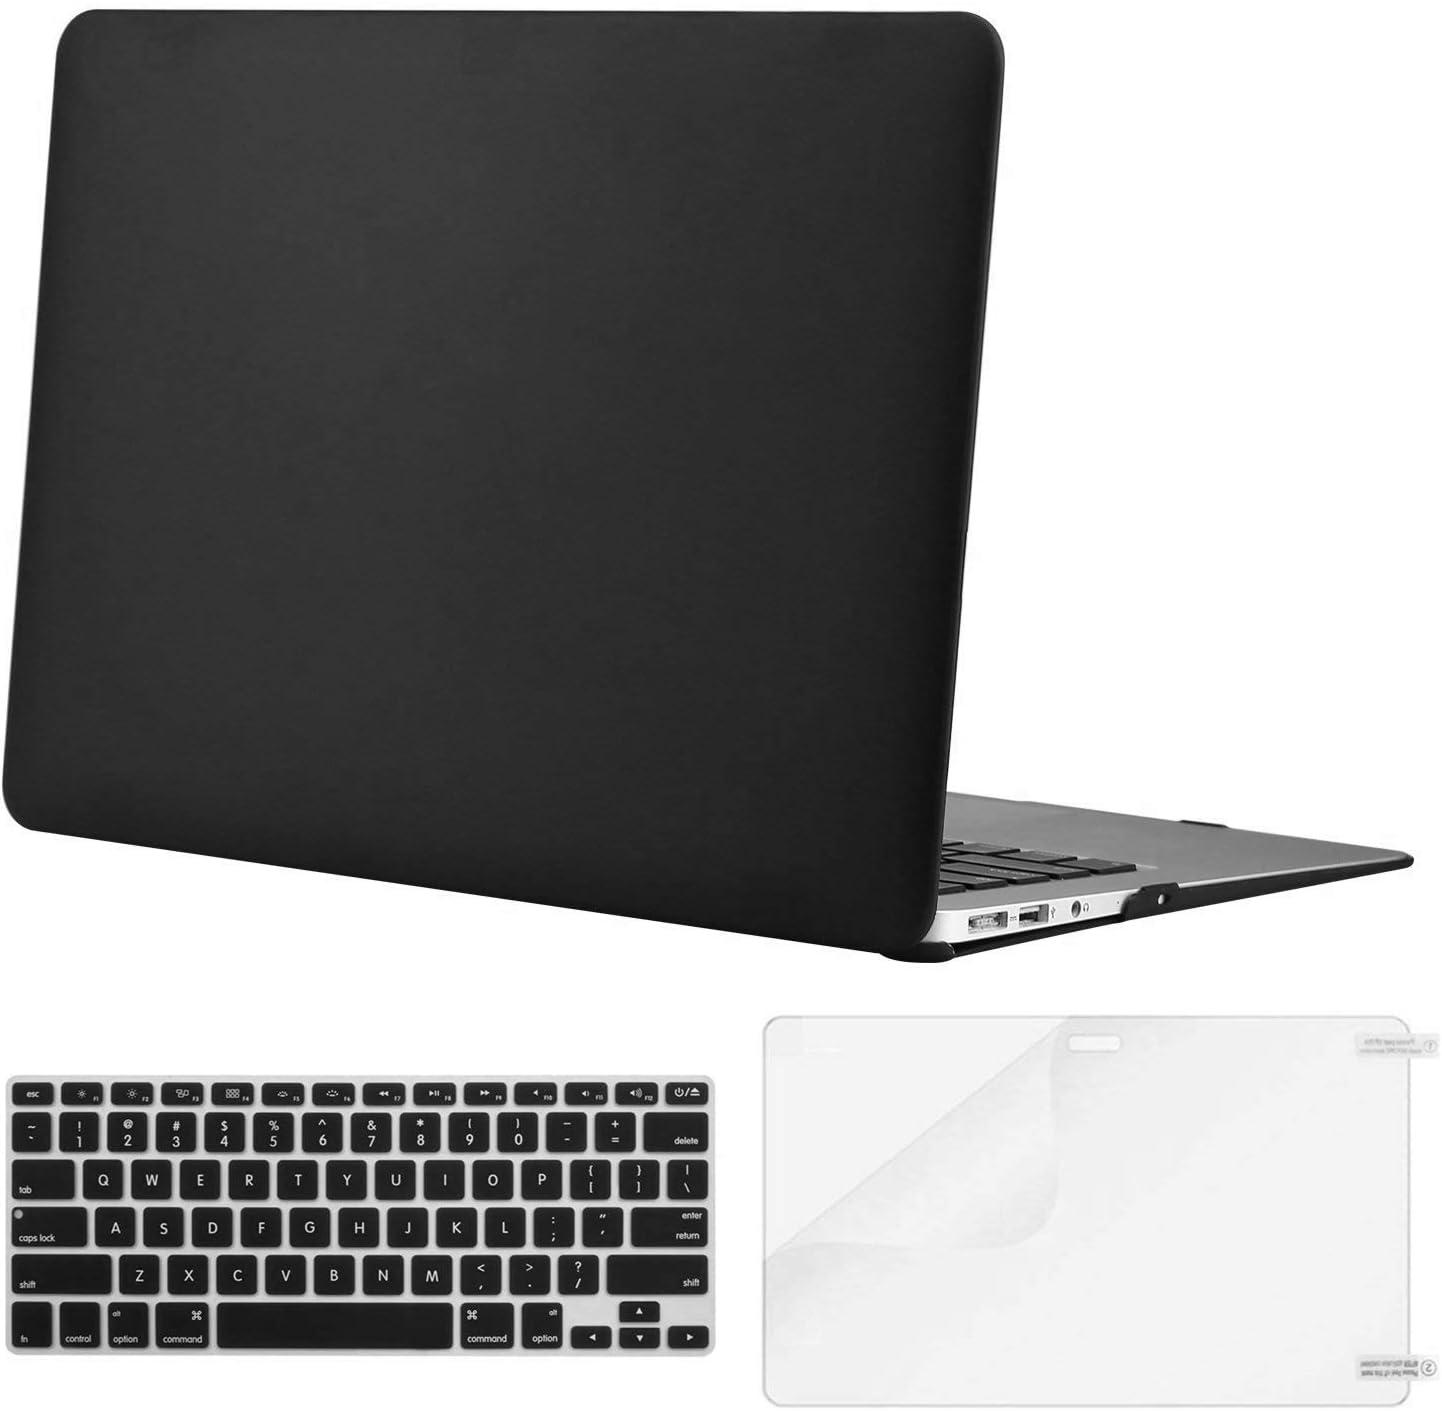 Lacdo Laptop Hard Case Shell Cover, Black